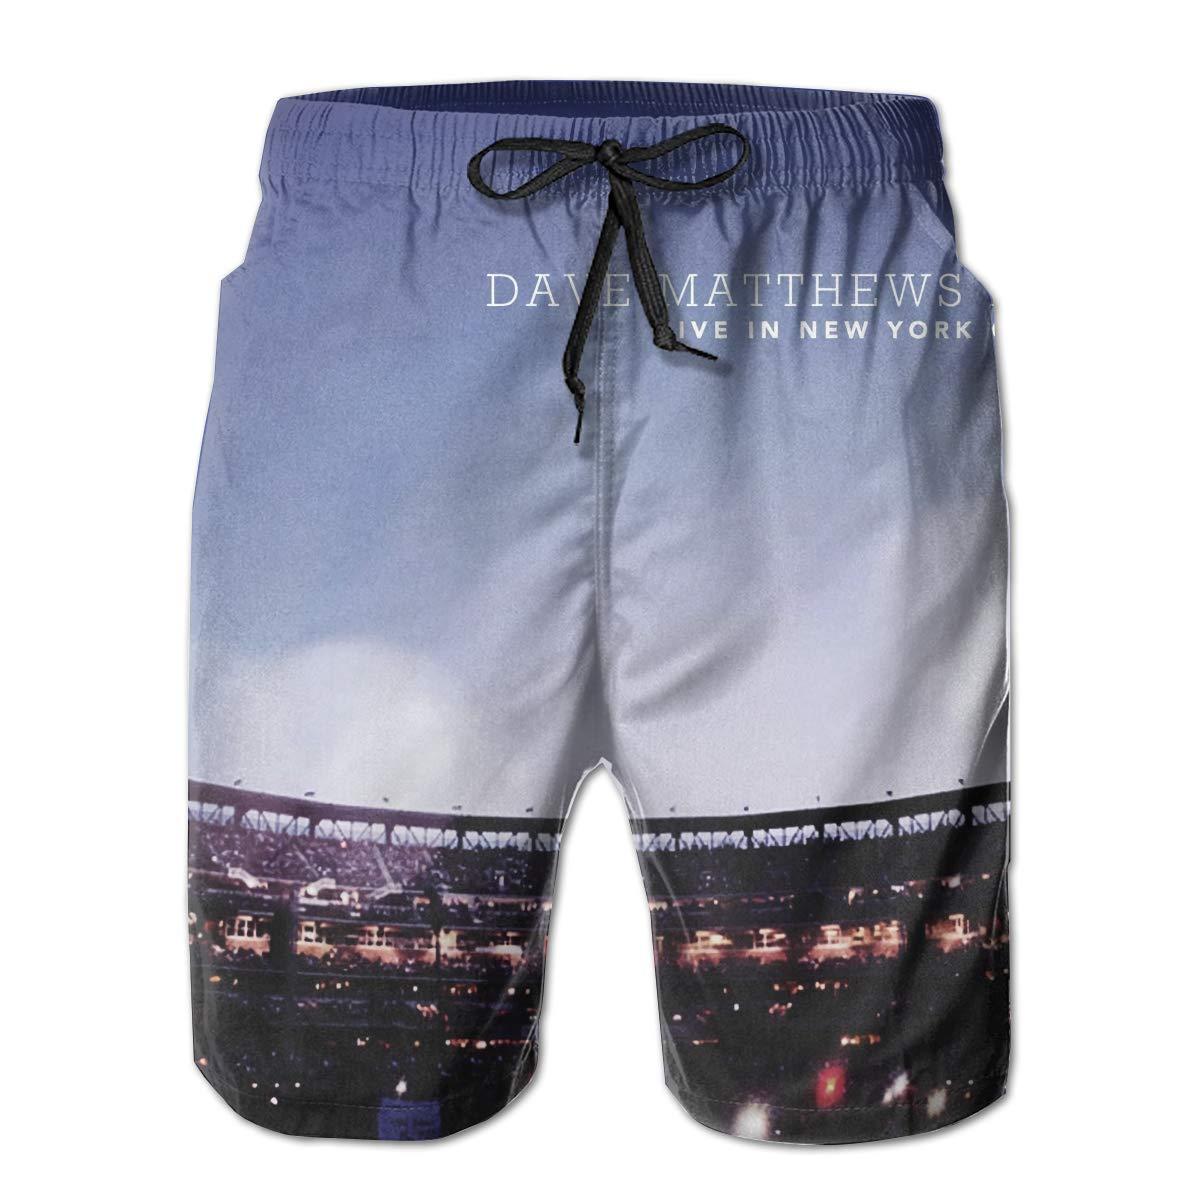 Dave Matthews Live in New York City Mans Summer Beach Shorts Surfing Pants